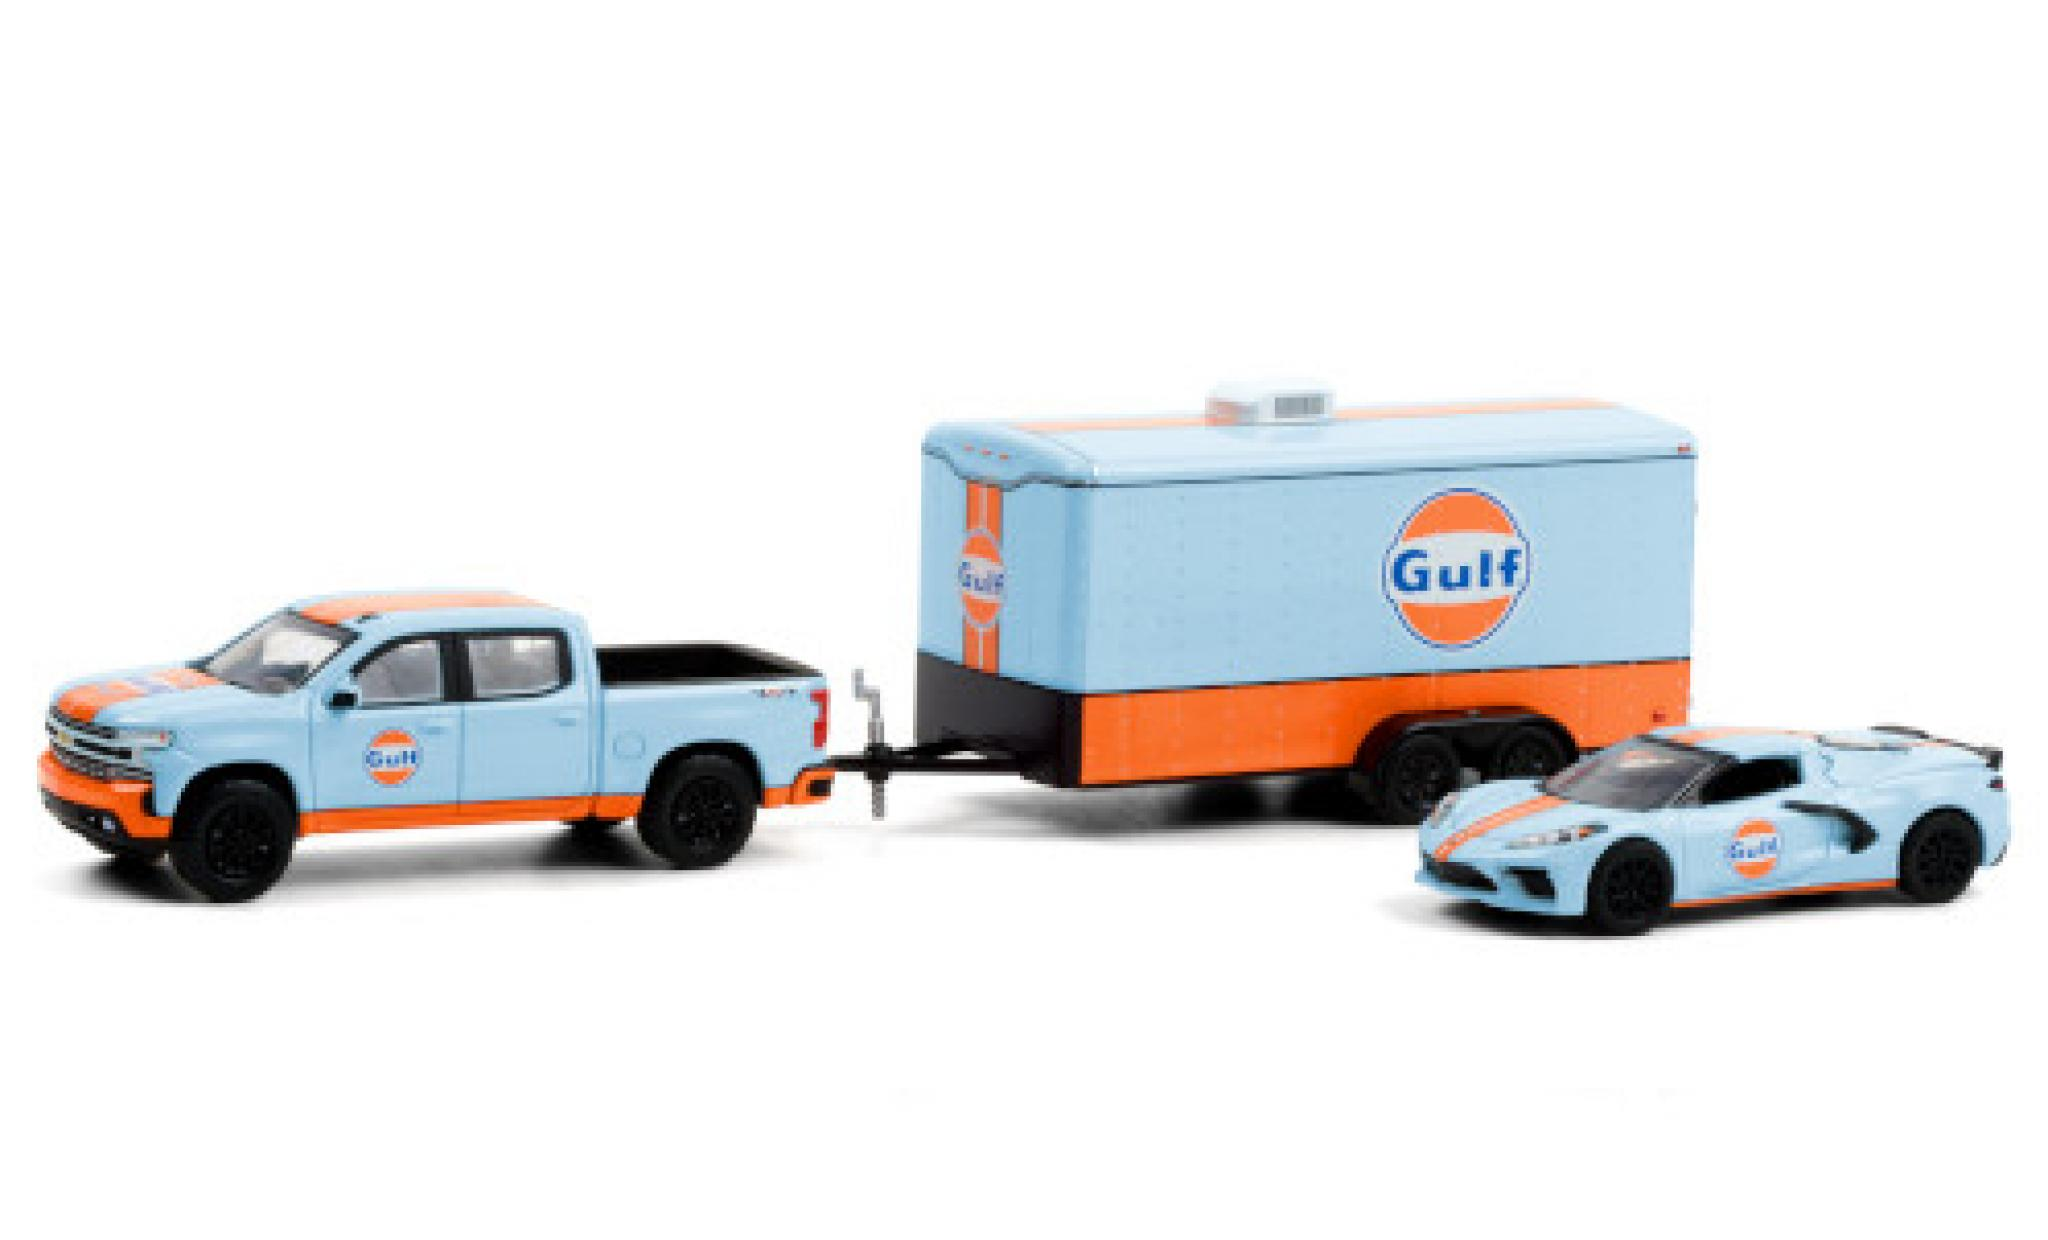 Chevrolet Silverado 1/64 Greenlight Gulf 2021 y compris les Corvette Stingray (C8) et fermé Remorque porte-voiture